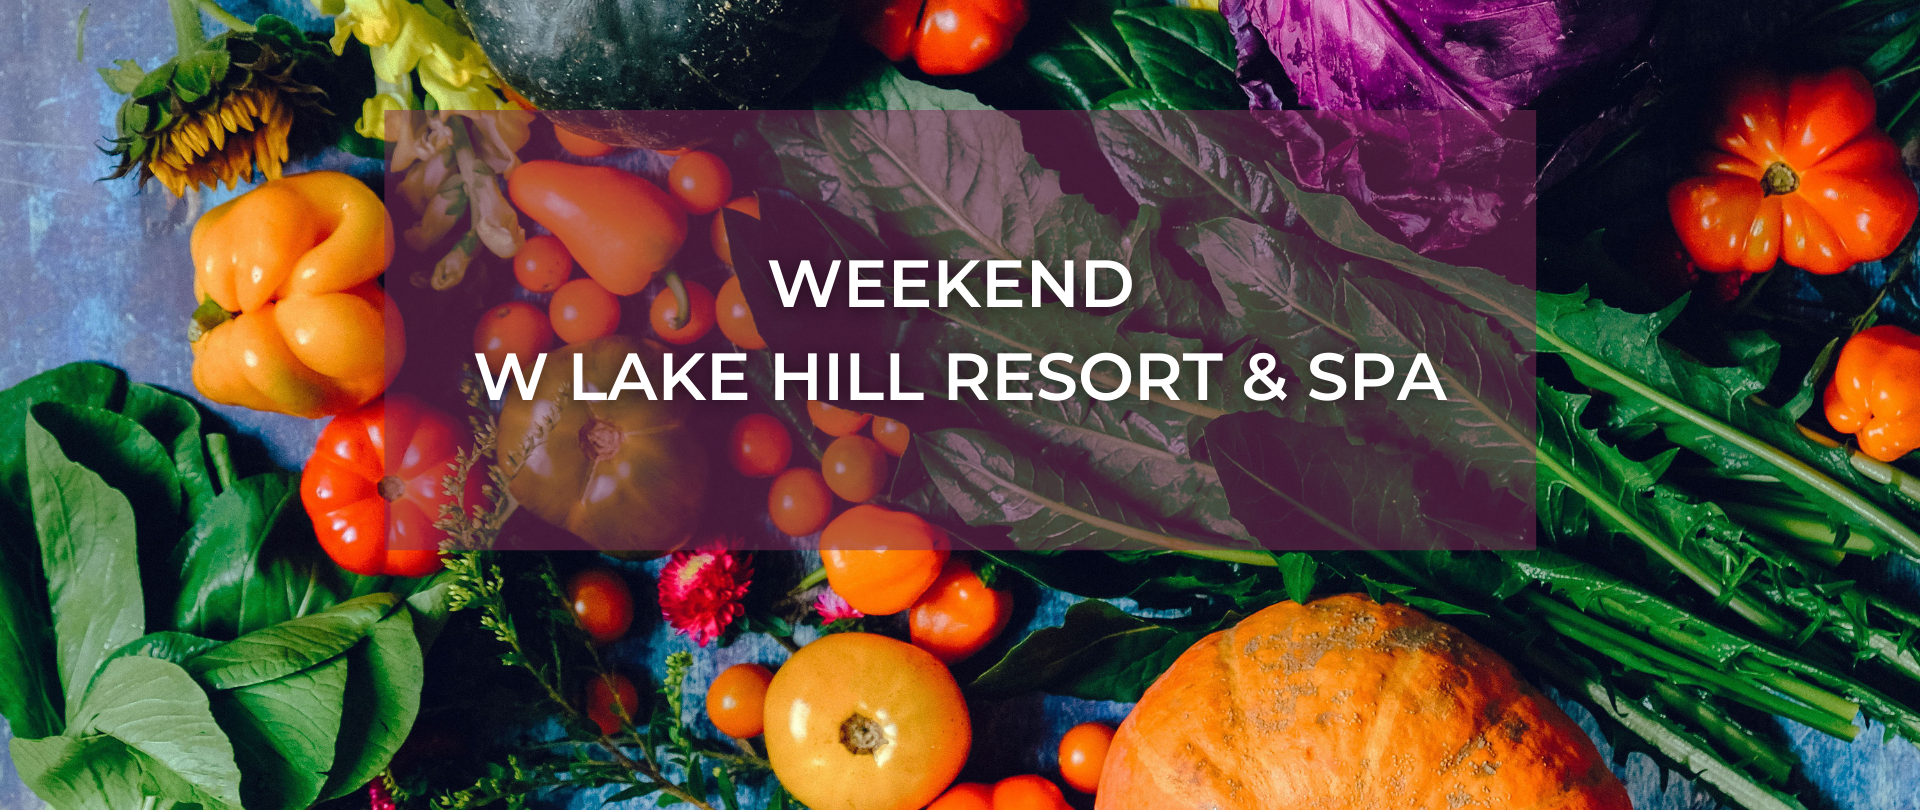 Regionalnie w Lake Hill Resort & SPA